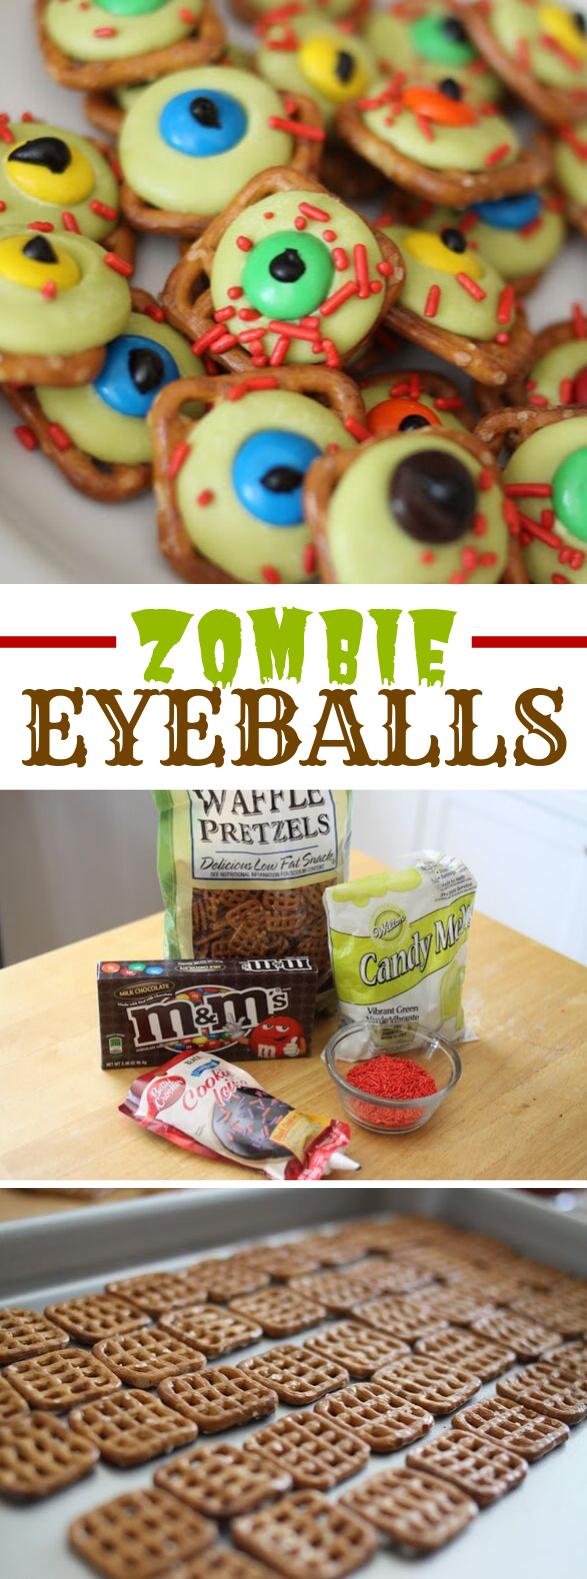 Zombie Eyeballs #desserts #halloween